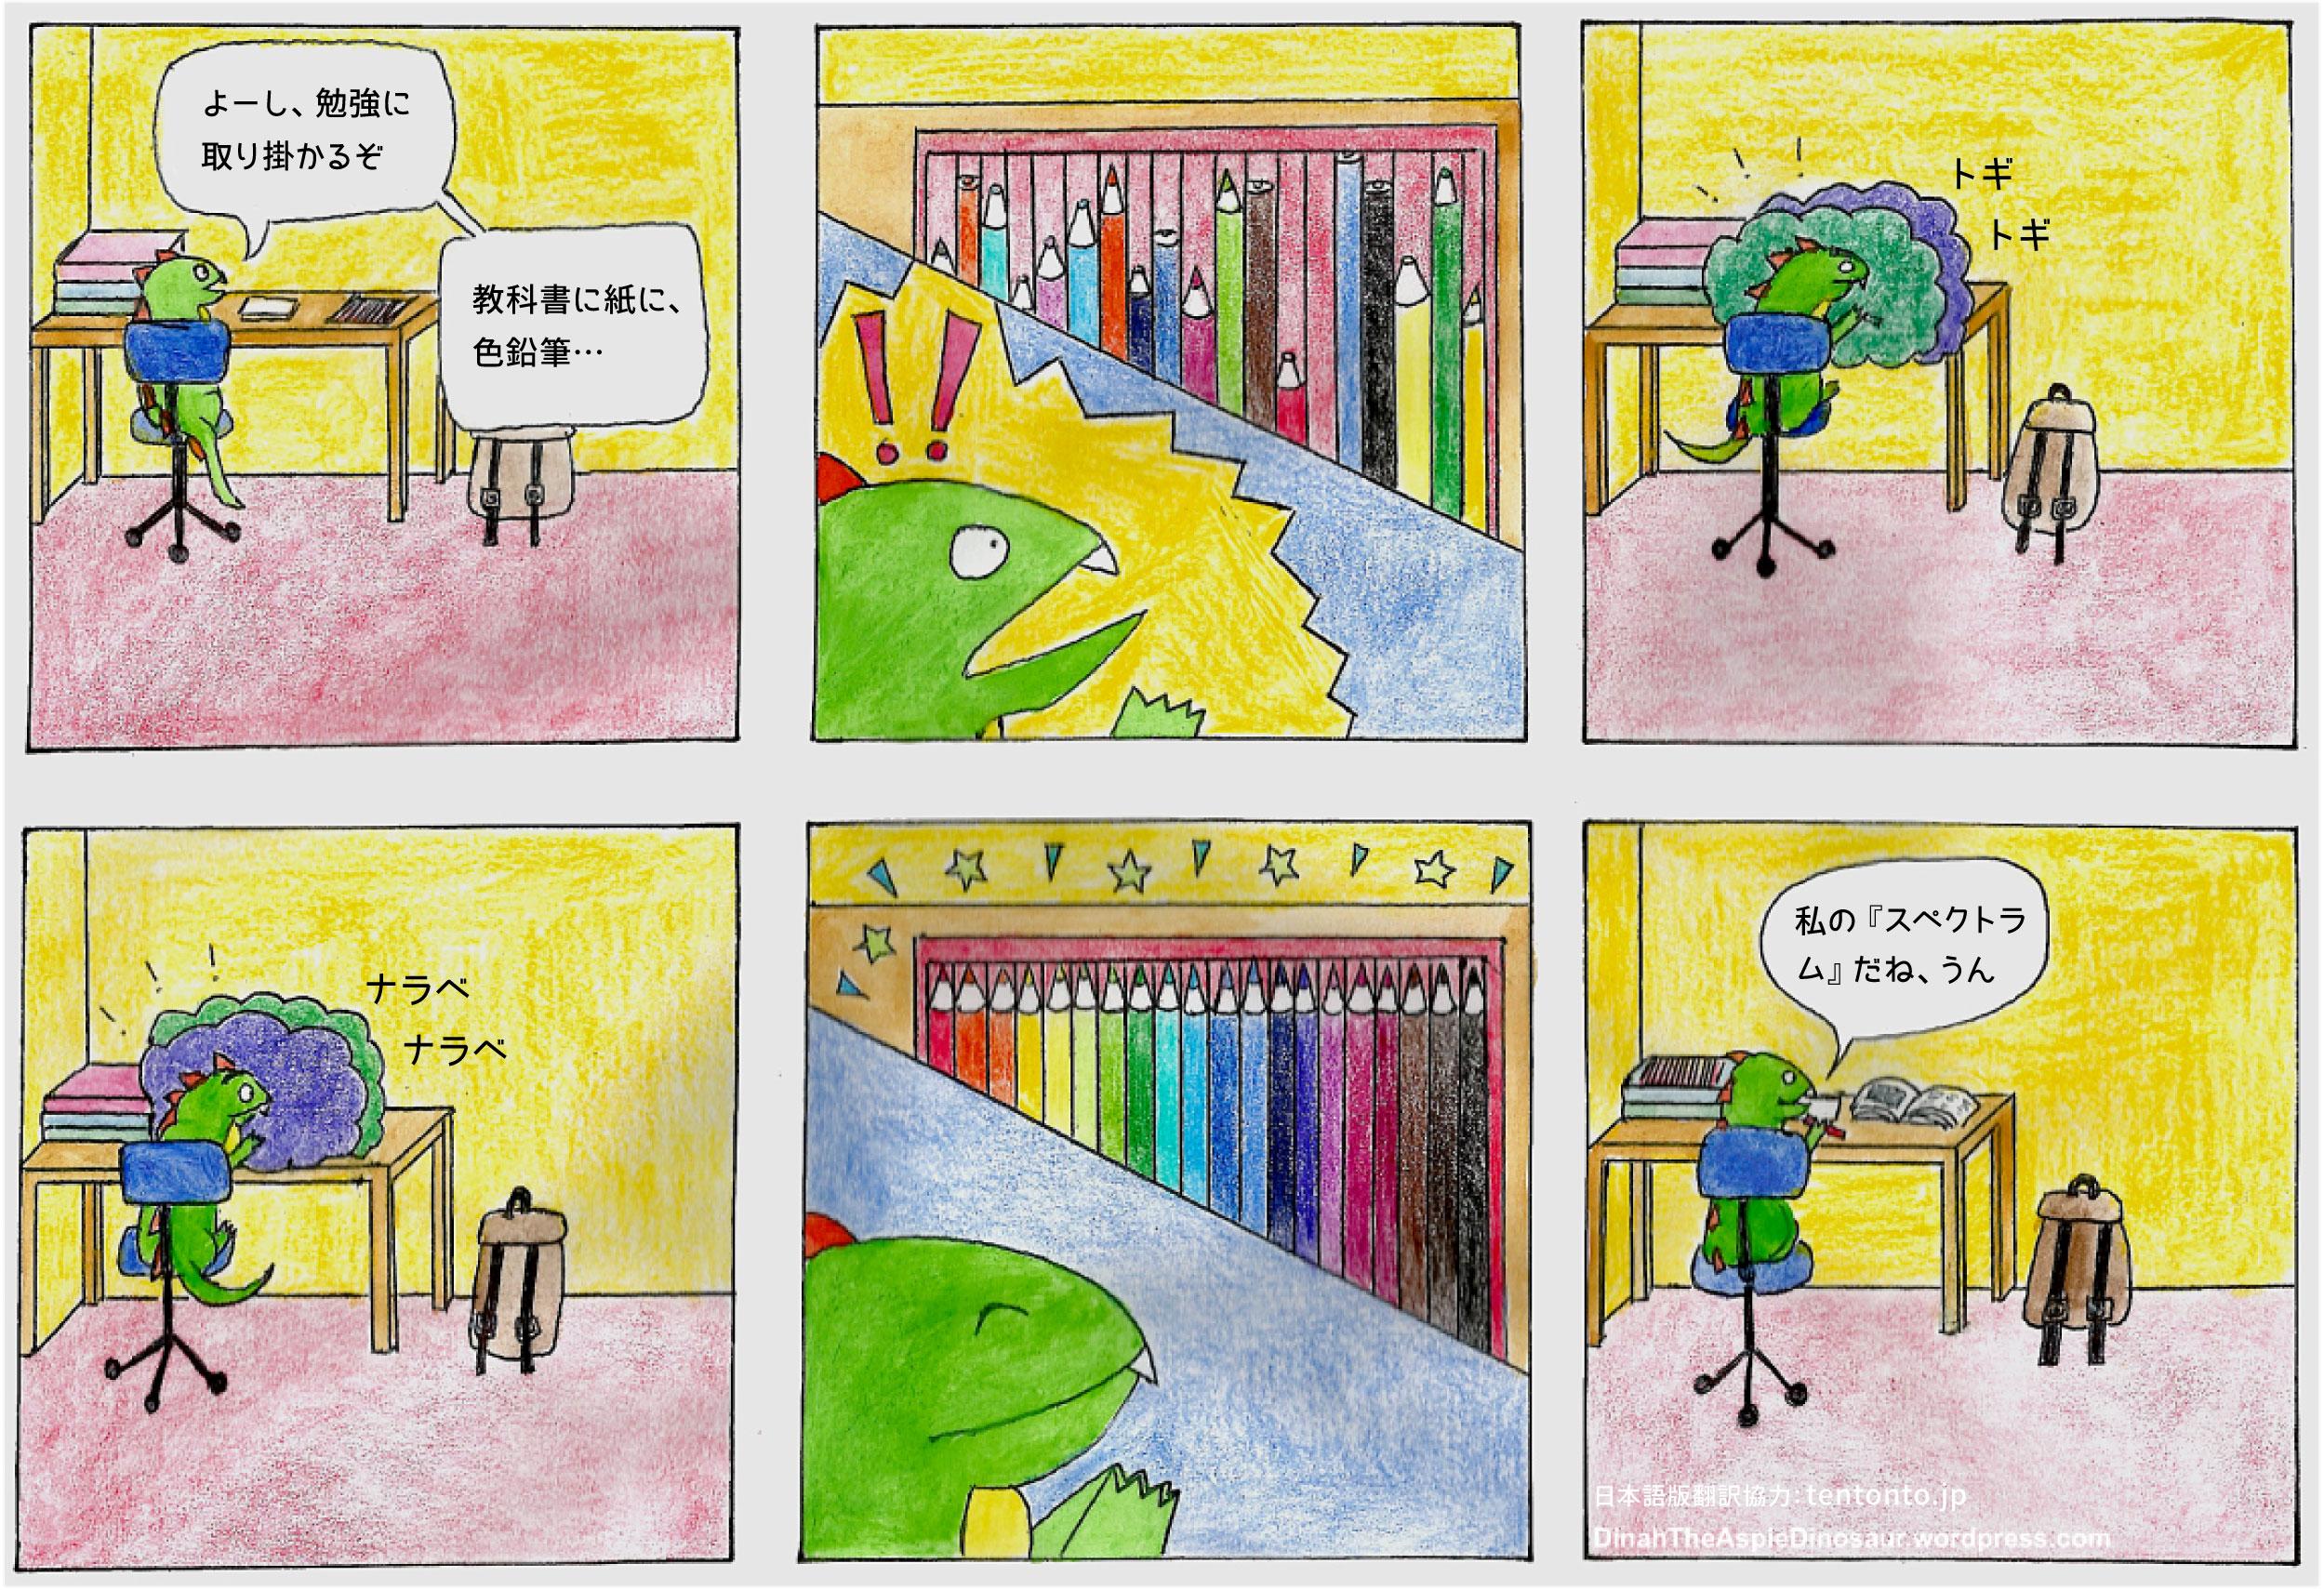 dinah_tentonto_pencils_jpn